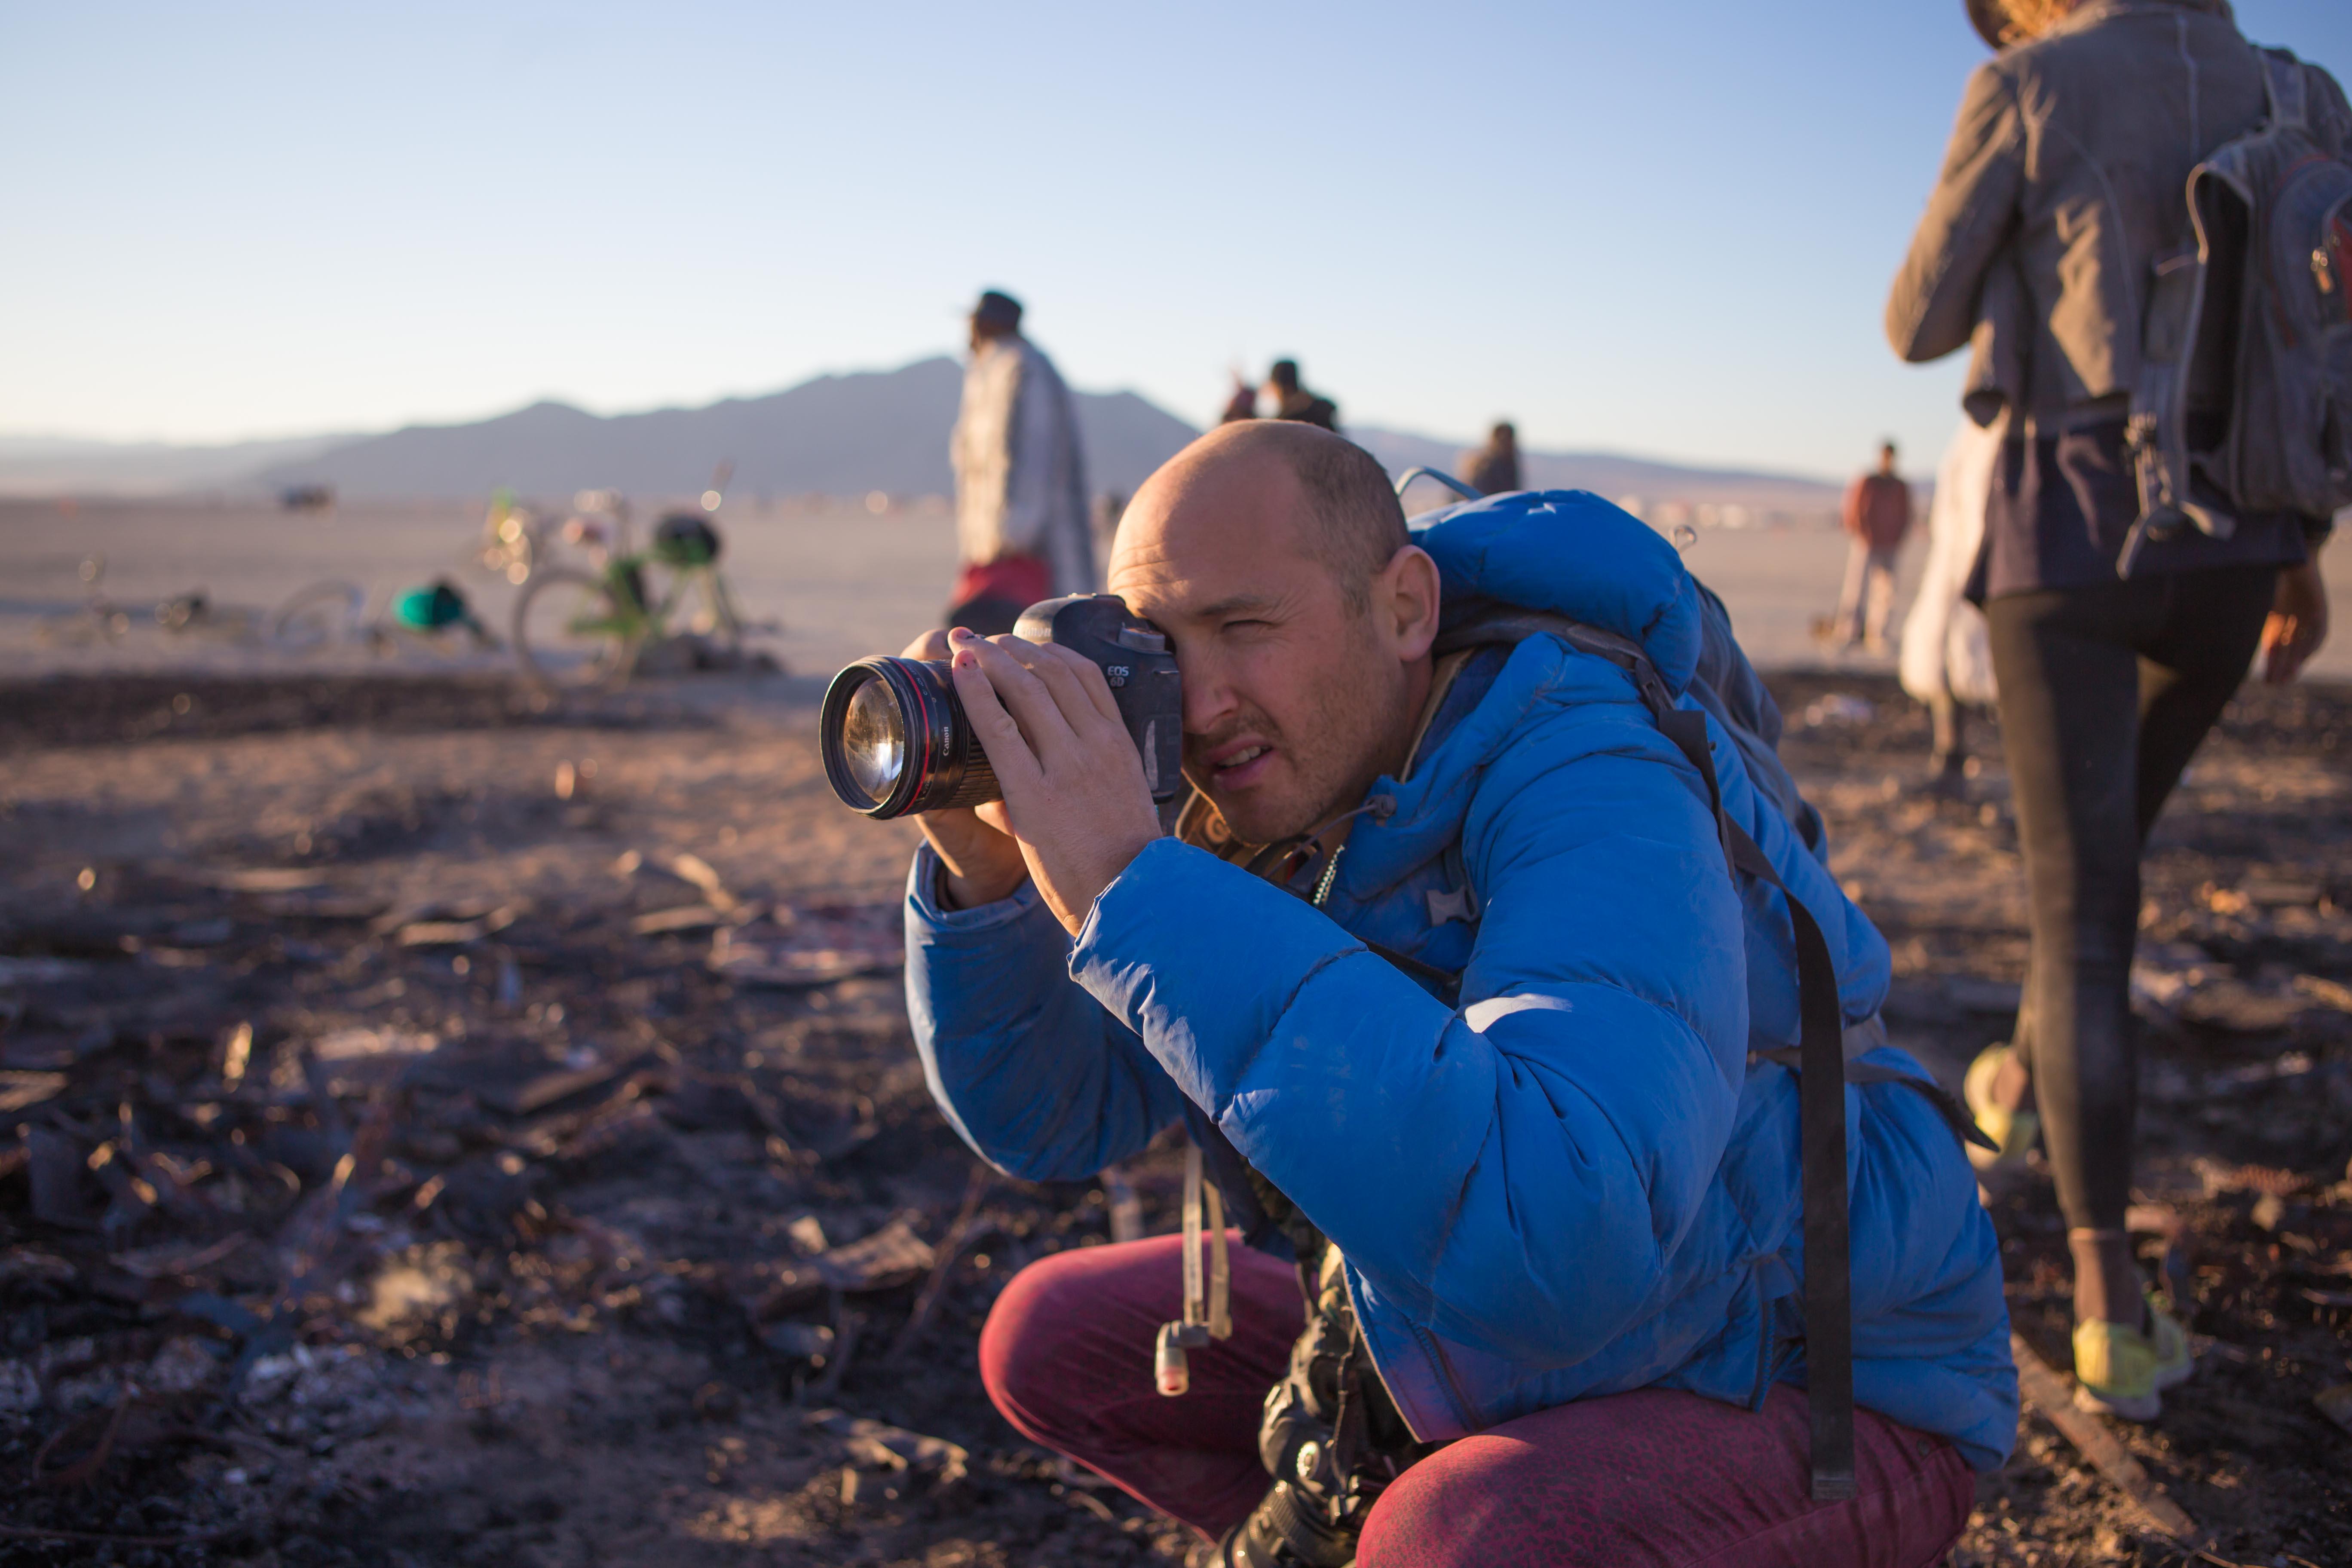 Jonathan Clark at Burningman